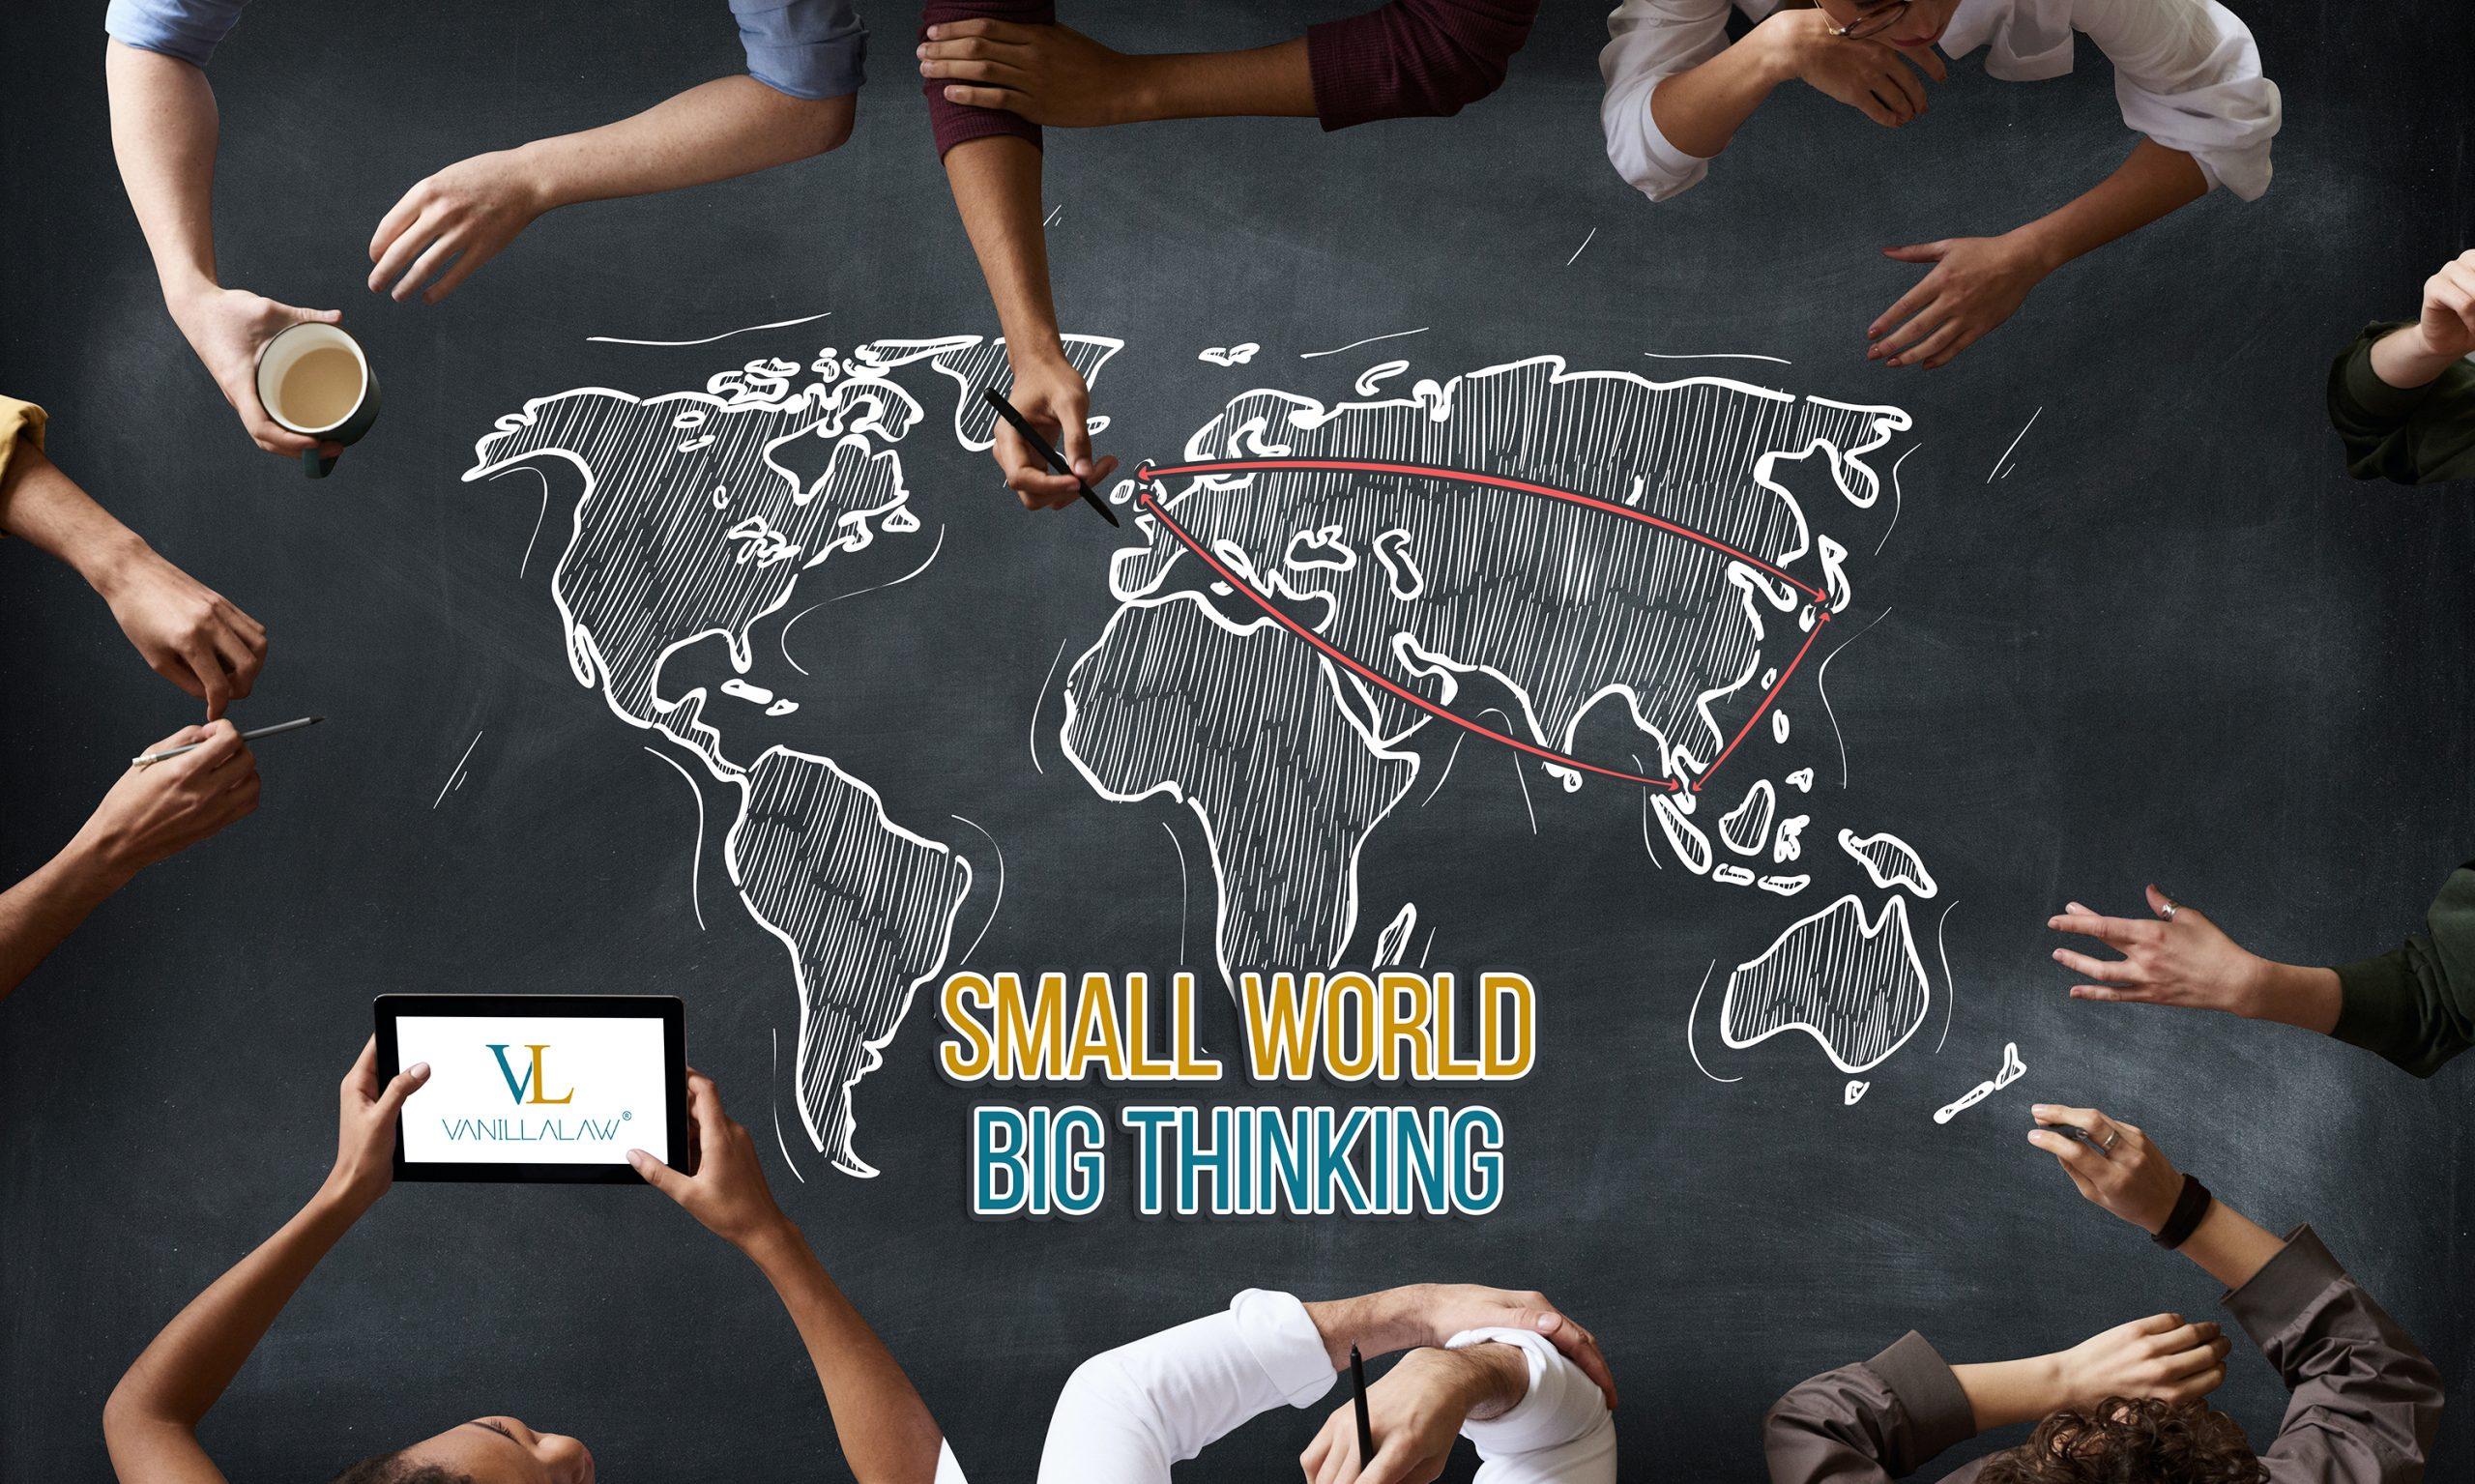 200525_-_Small_World_Big_Thinking_(3)